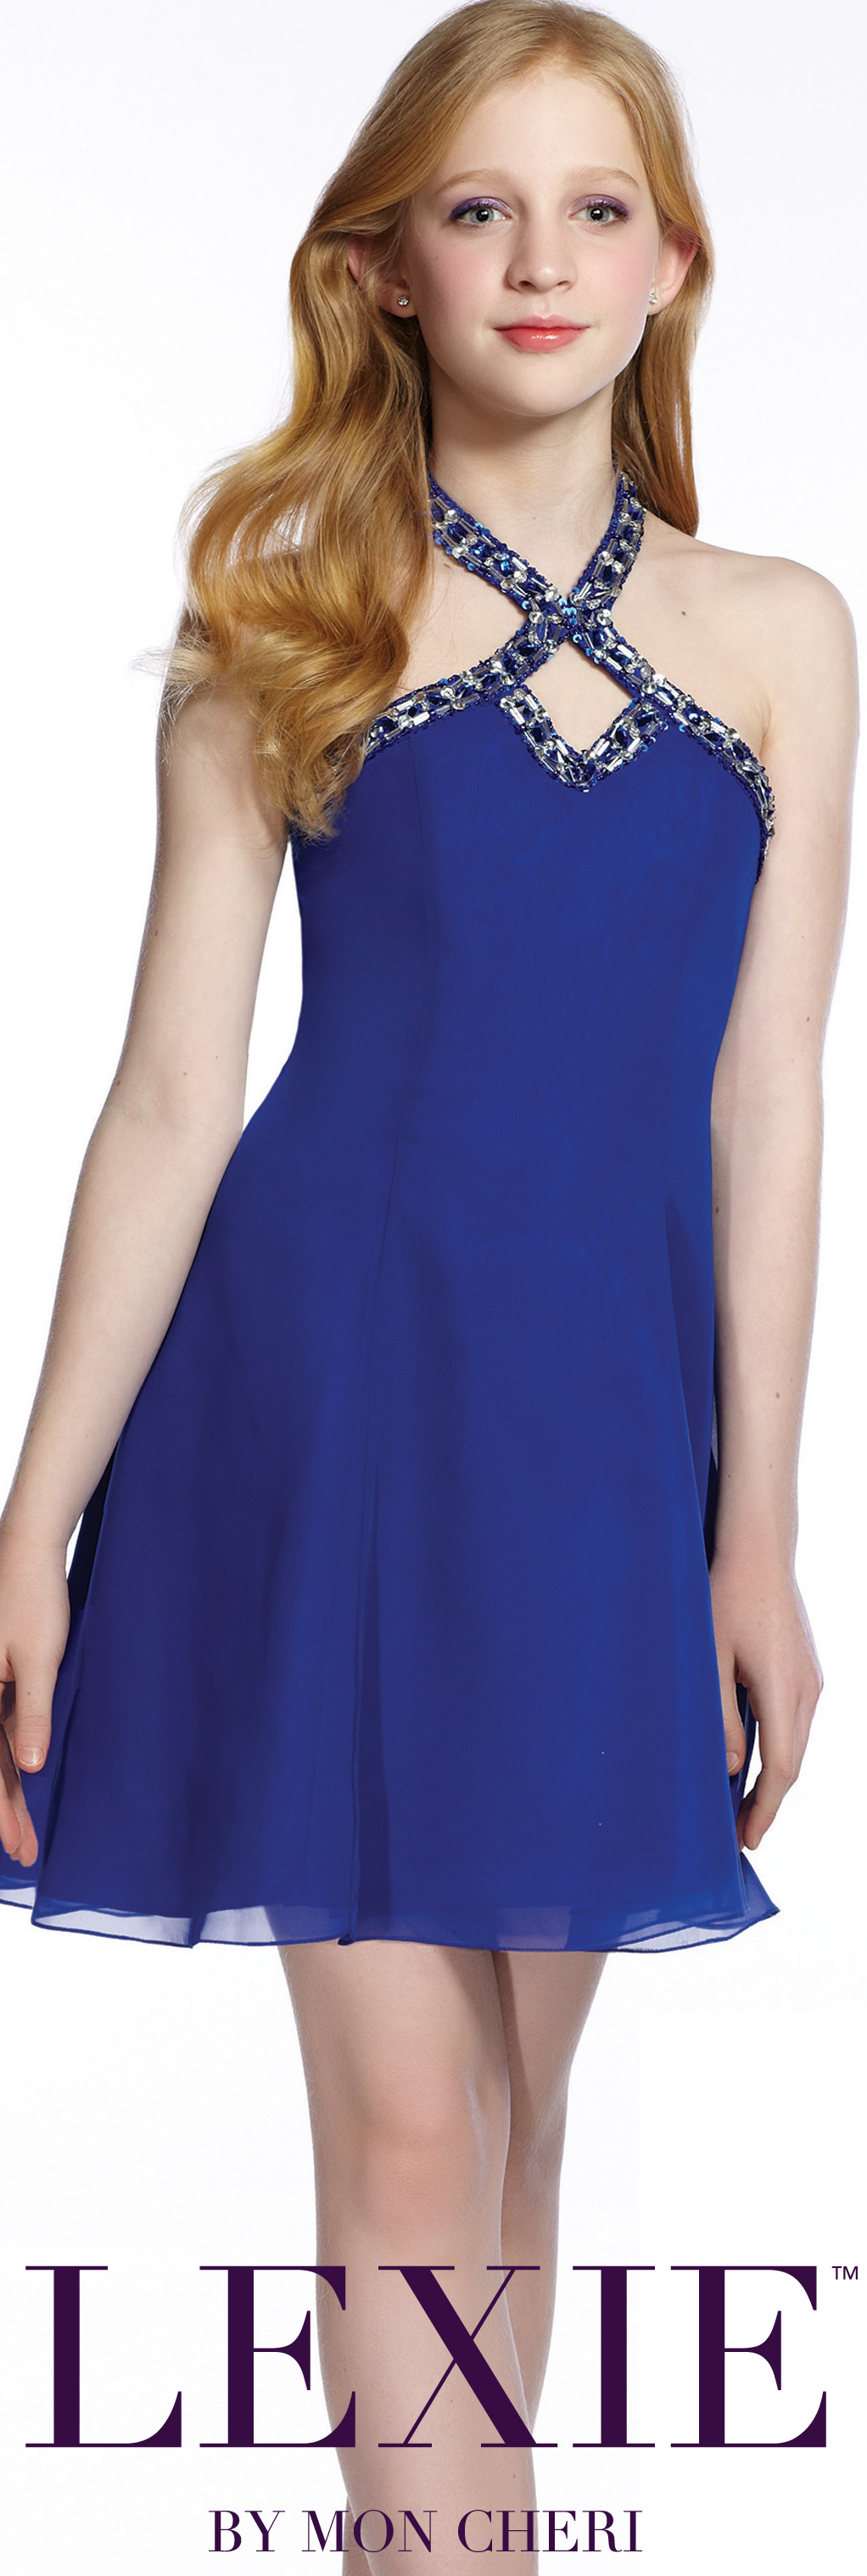 Lexie by Mon Cheri - Tween Formal Dress - Style No. TW21541 ...